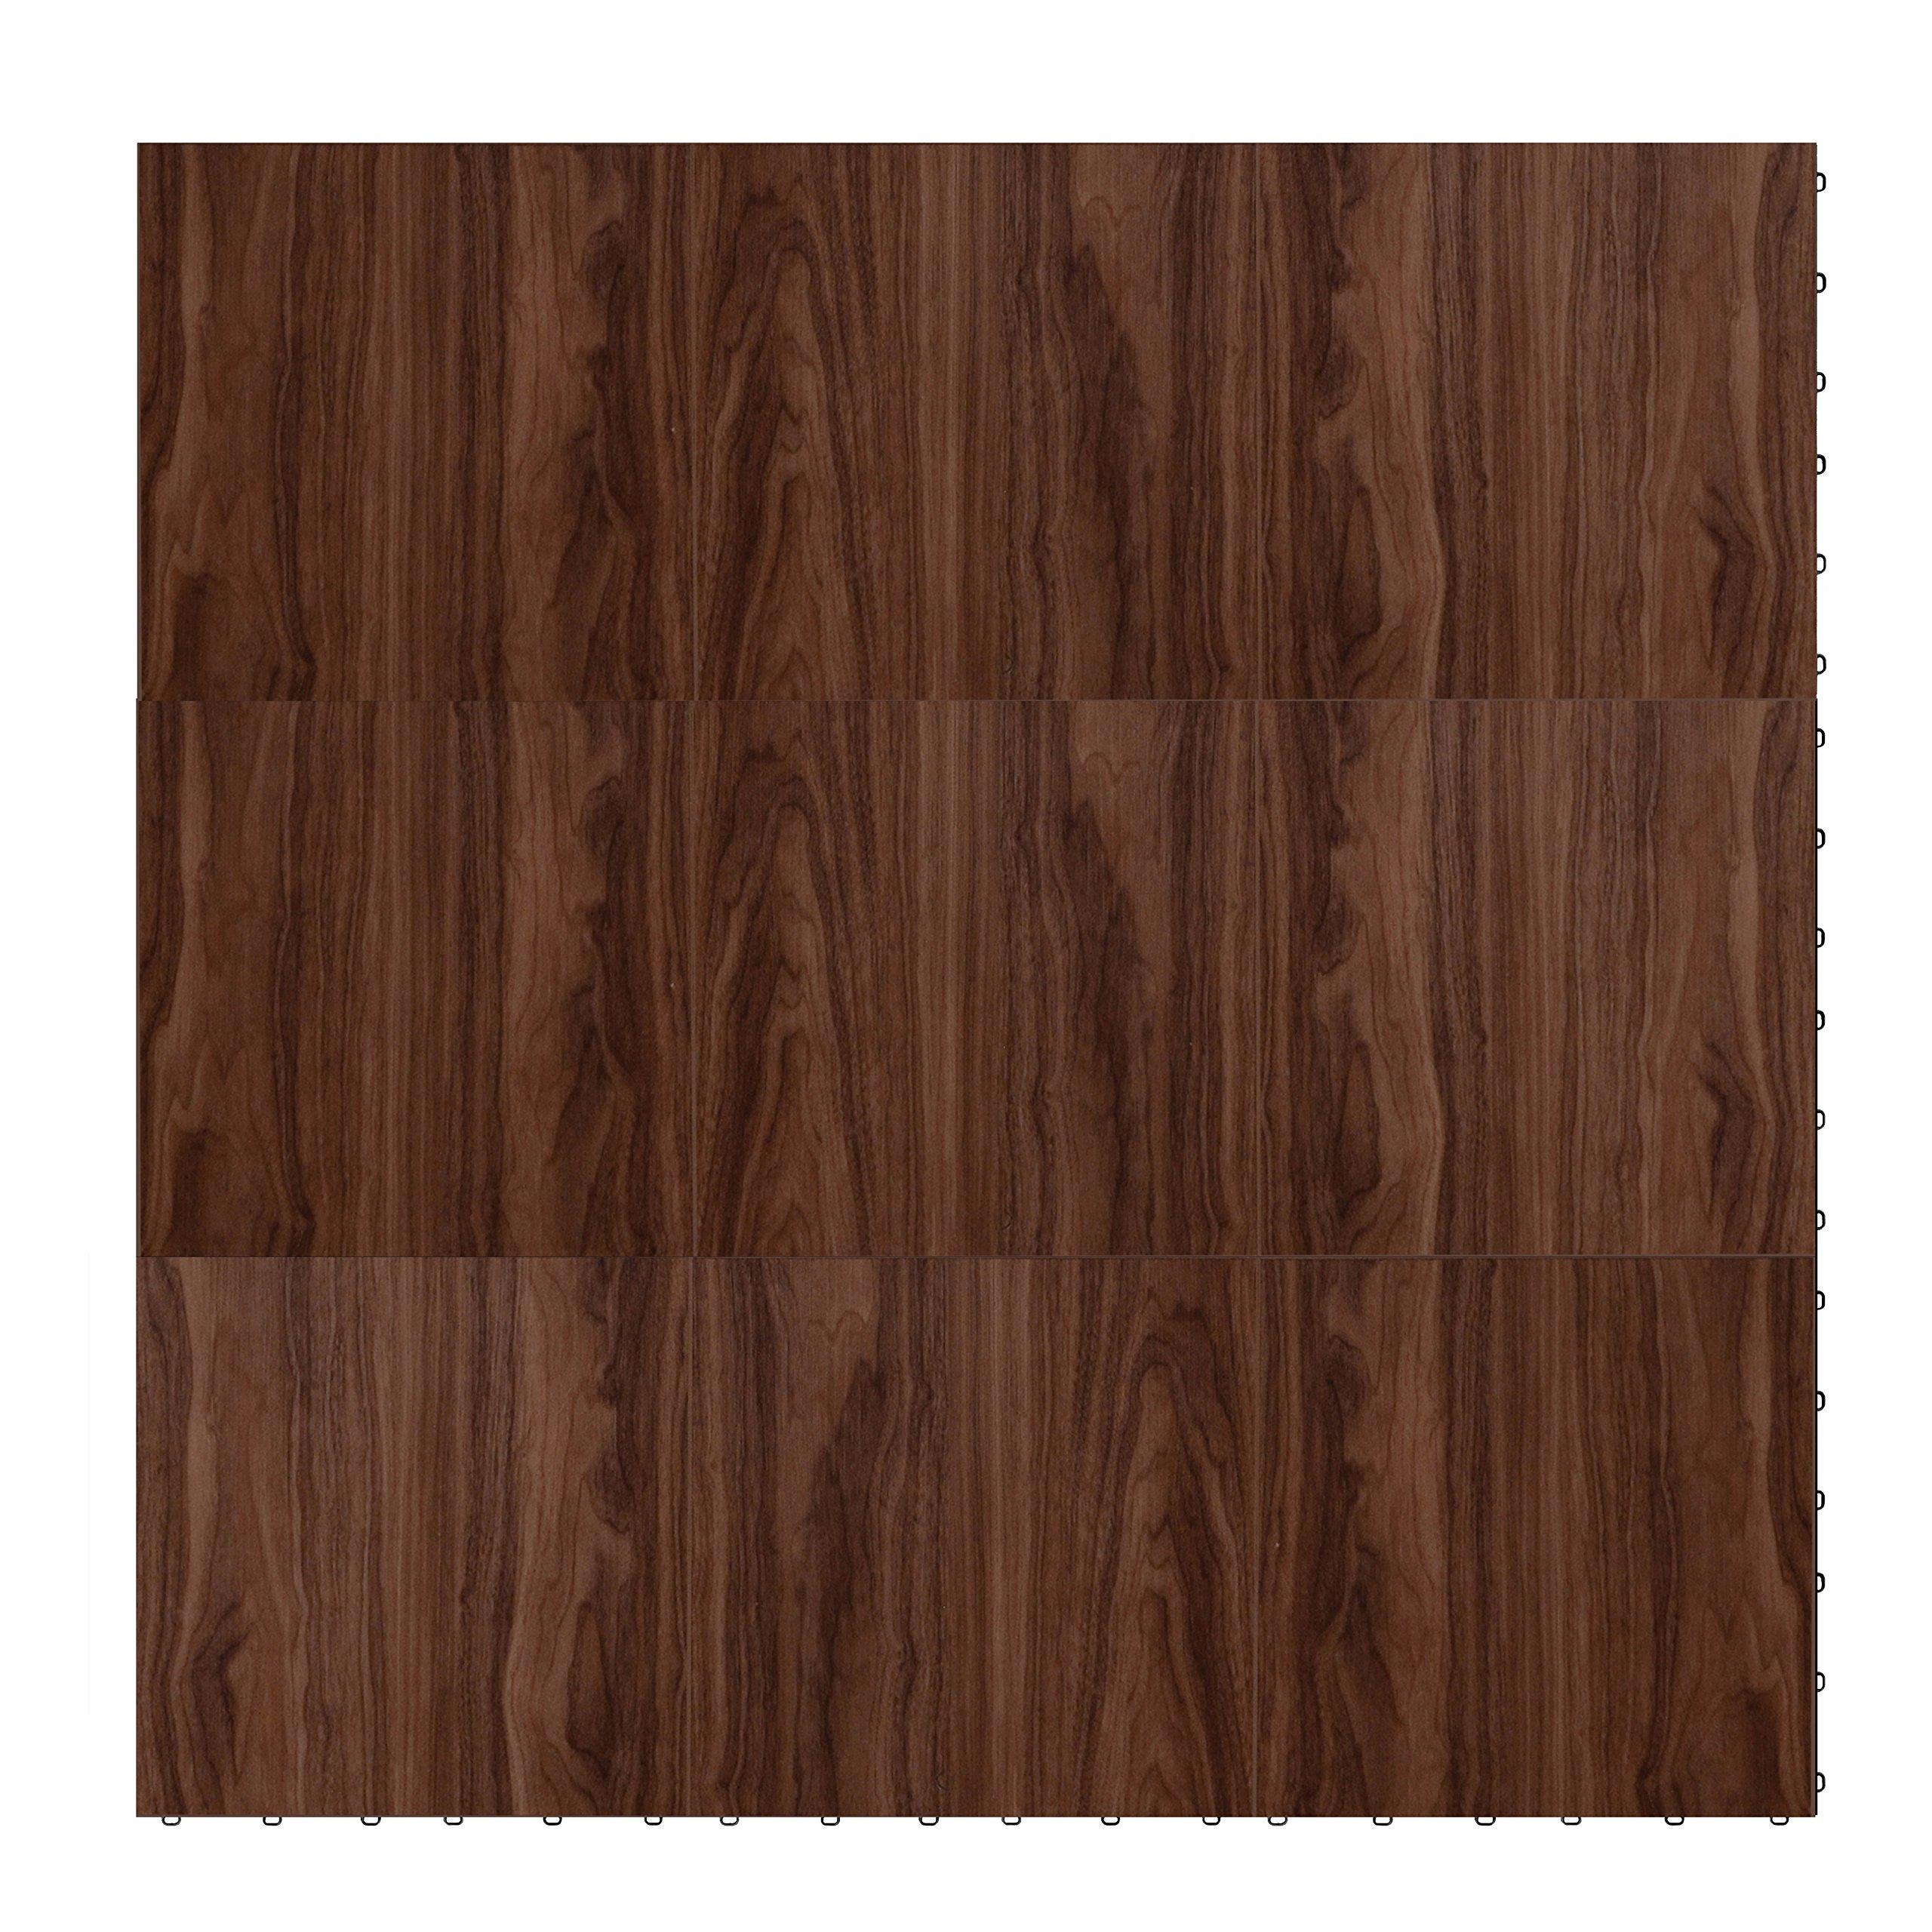 "Swisstrax ¾"" thick Interlocking ""Hardwood"" Floor Tiles (4' x 4' Section) - Dance Floors, Office Areas, Event Floors & more! (Medium Maple) by Swisstrax"